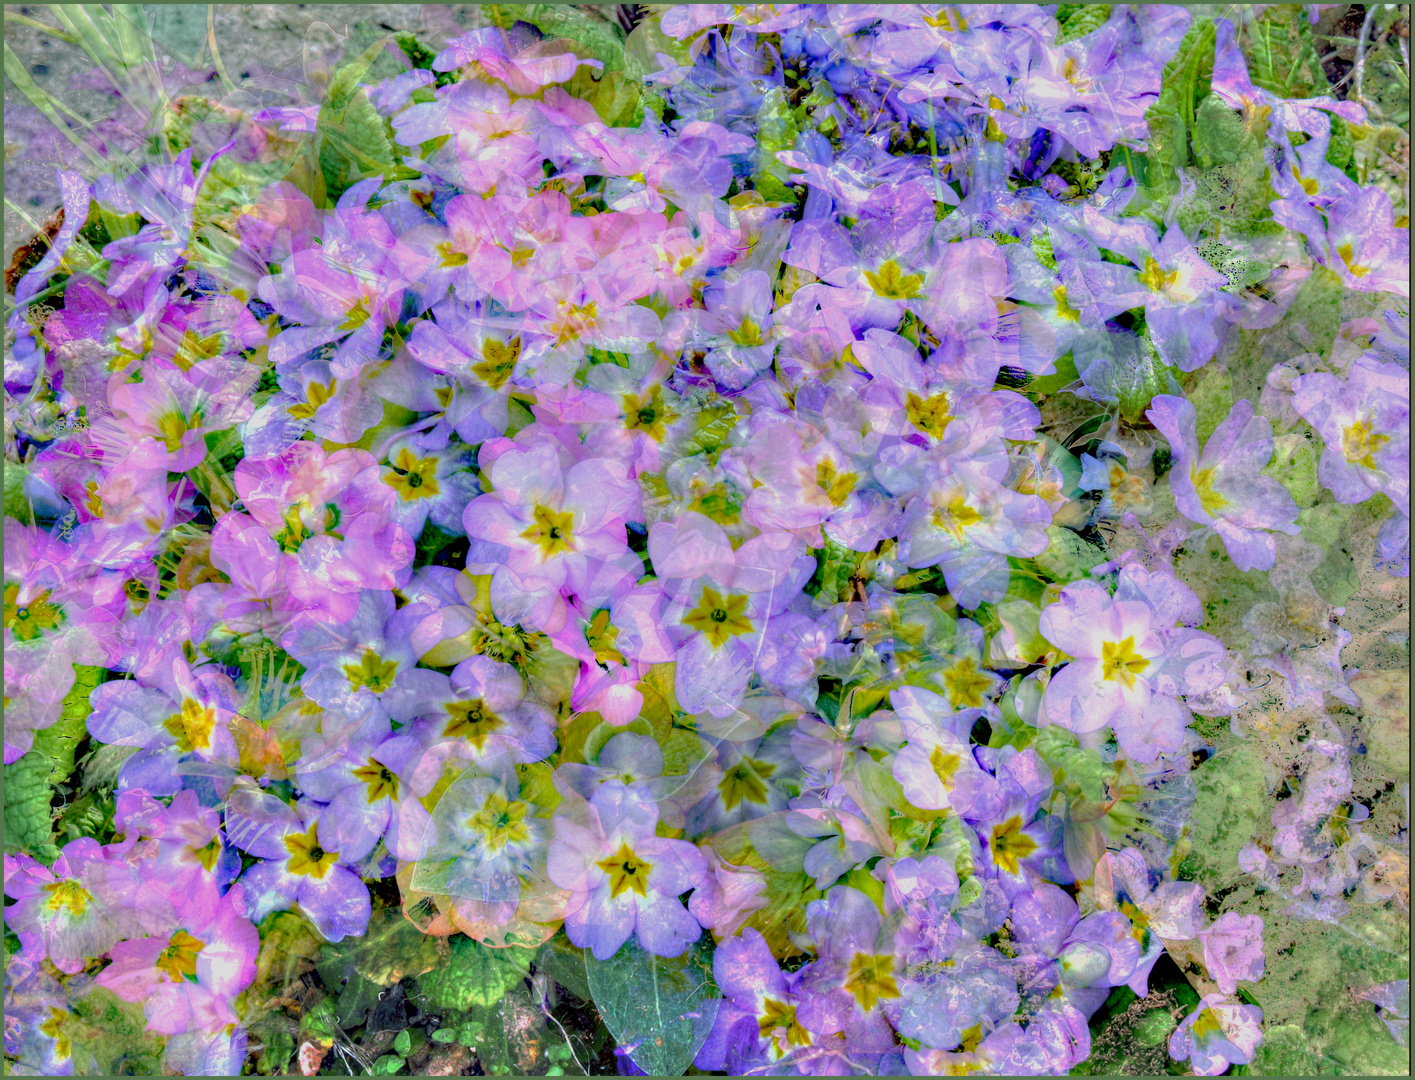 Frühling auf der Wiesen . Primavera sobre los campos